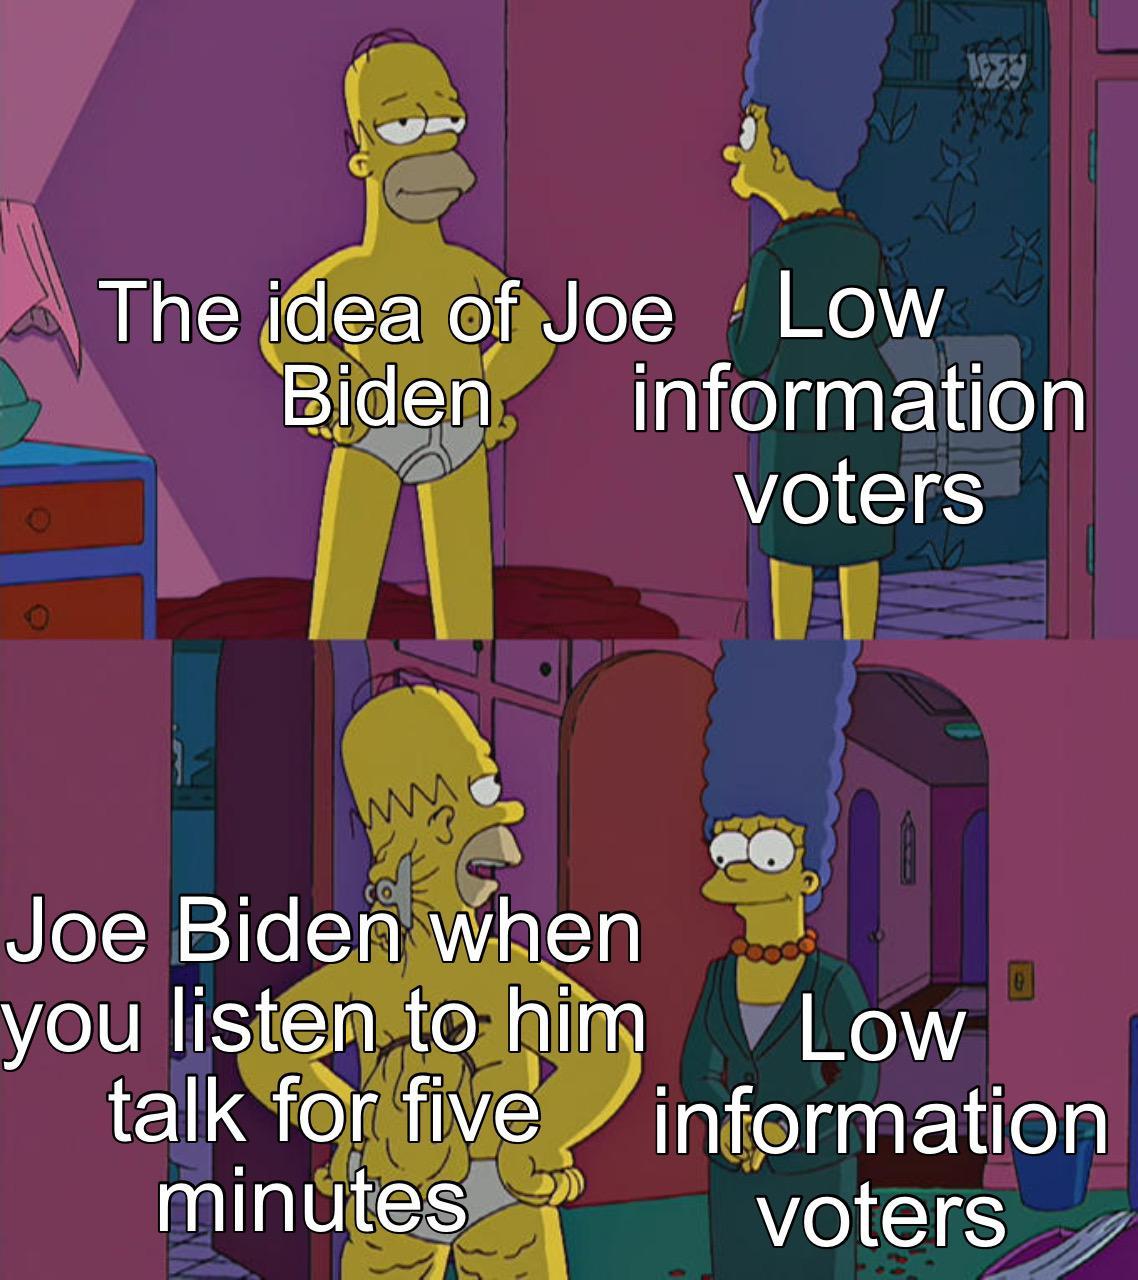 Political, Biden, Joe Biden, Trump Political Memes Political, Biden, Joe Biden, Trump text: 0 @ 厚 当ま@ろ/ つ